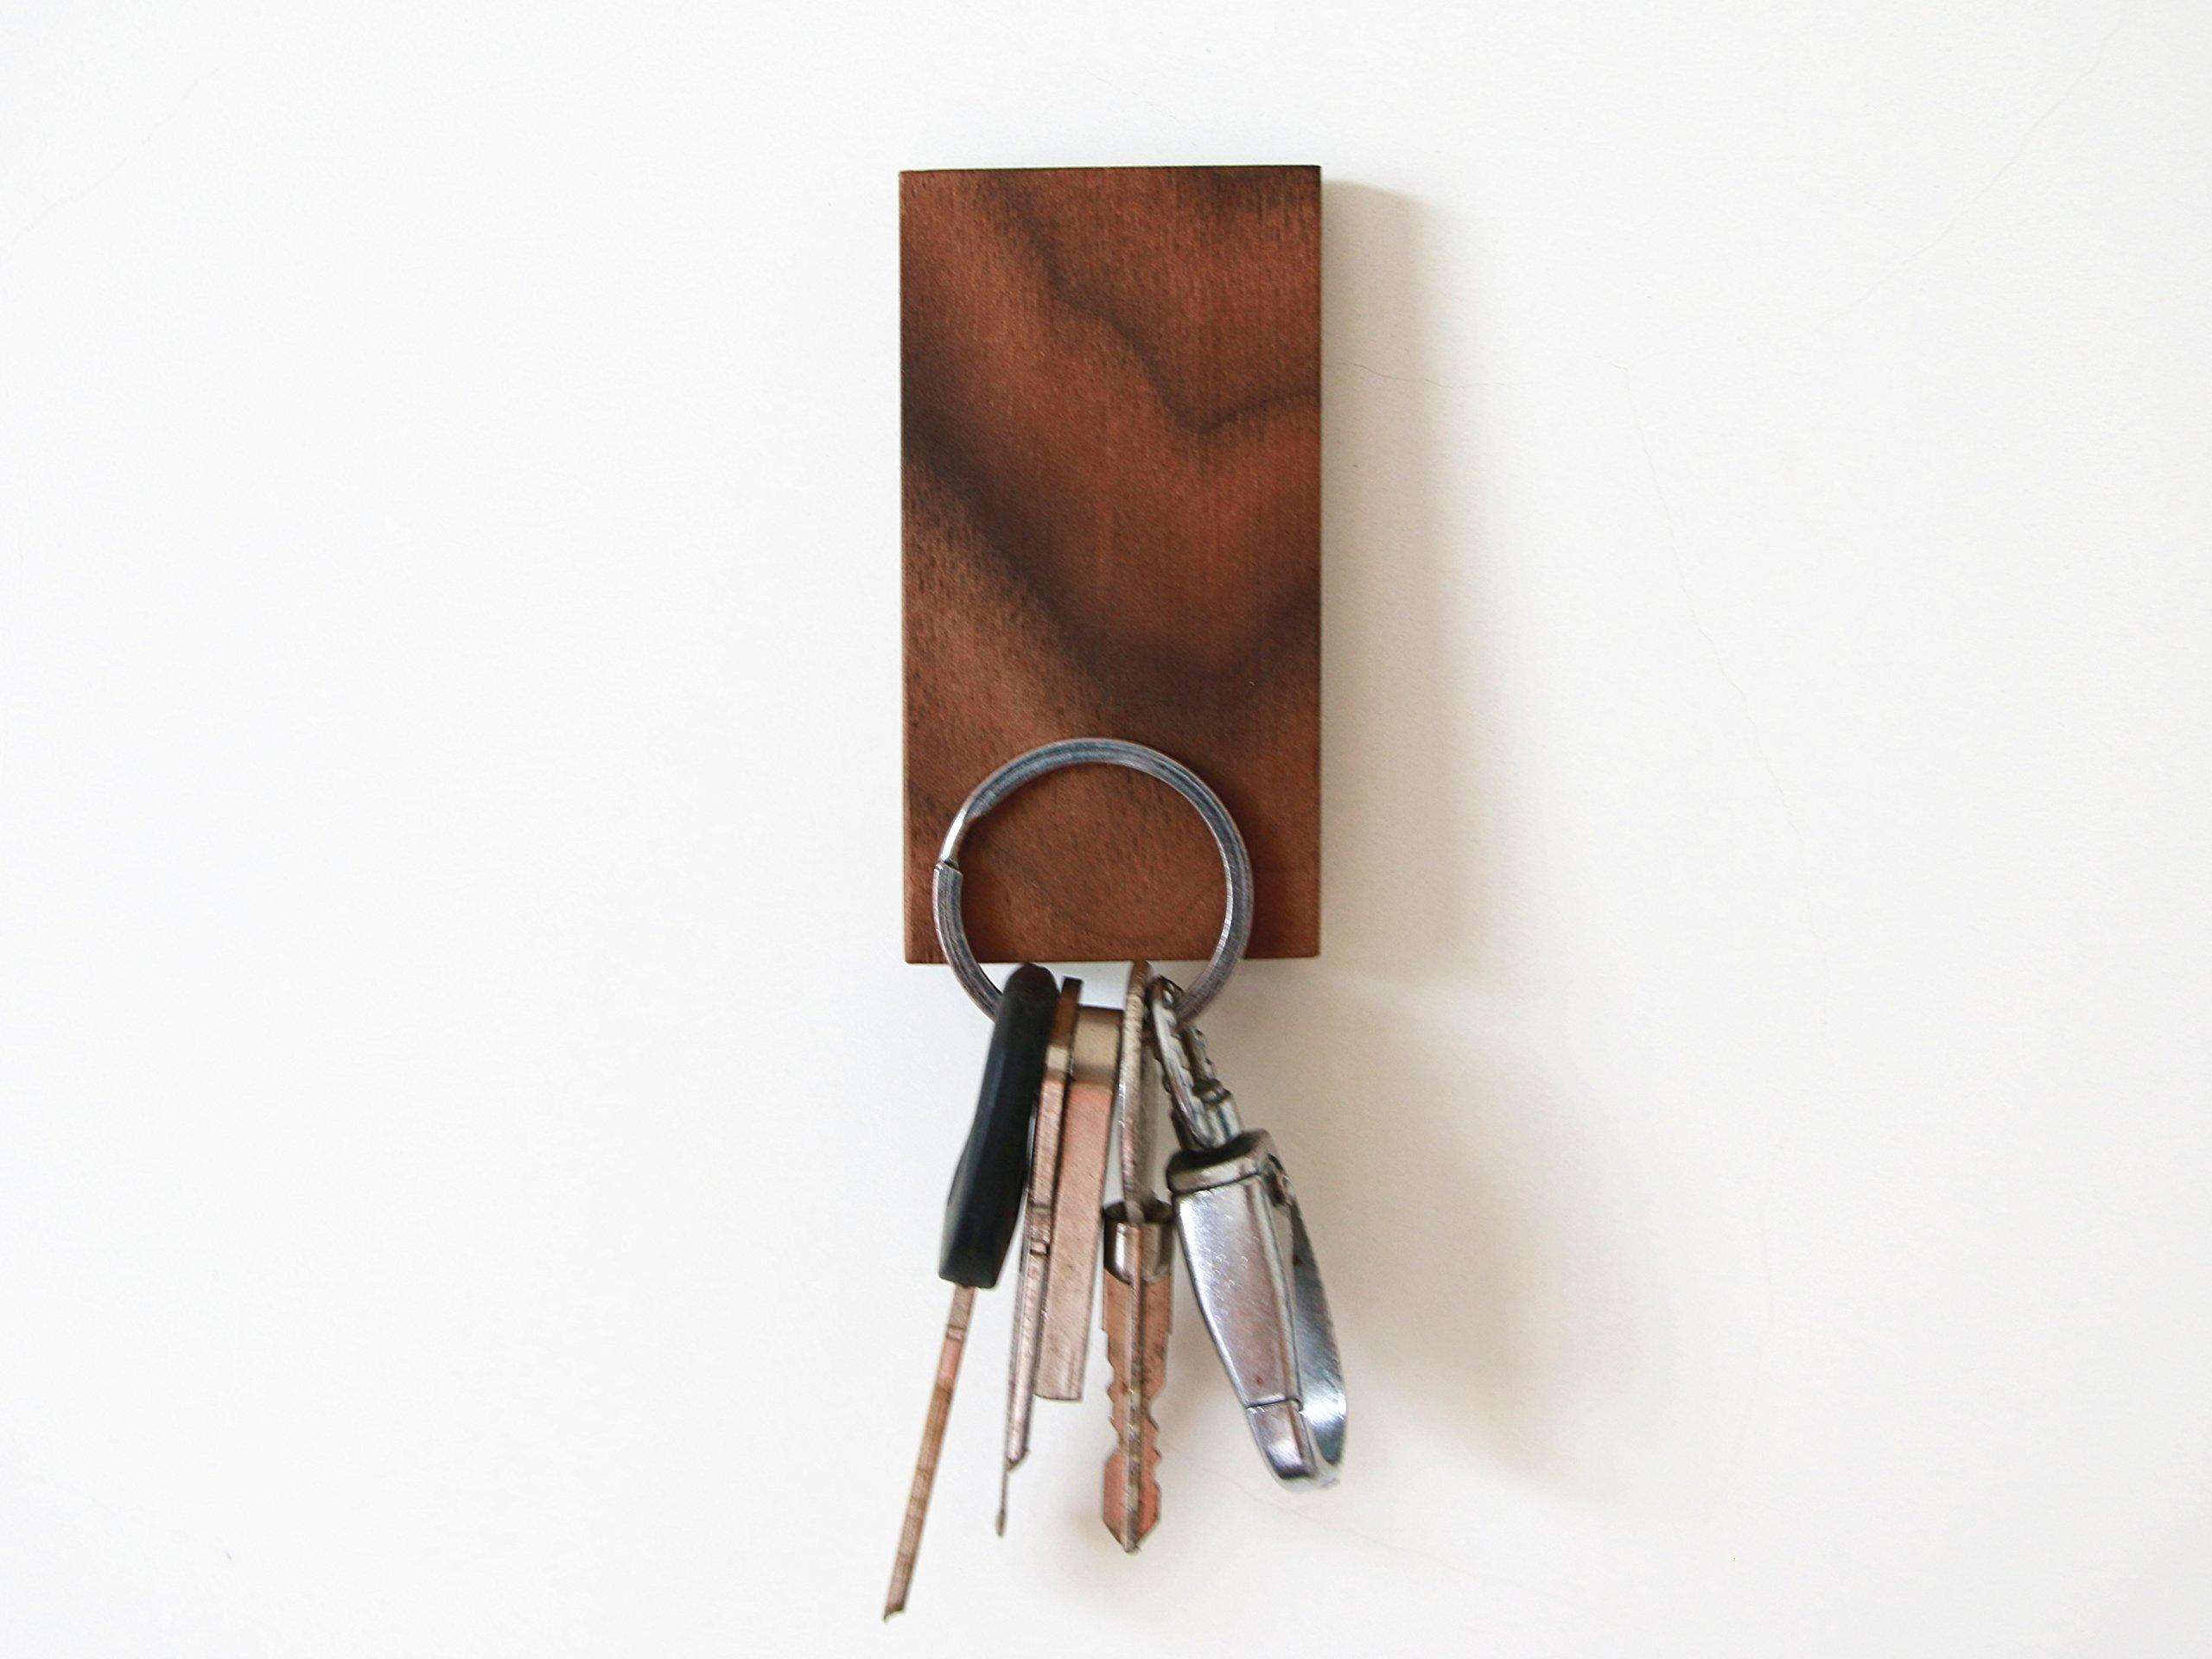 Walden Theory™ Minimalistic Magnetic Wooden Key Holder, Fridge Magnet, Key Hook Organizer, Key Rack, Modern Chic Stylish Original Design, Handcrafted, Key Ring Included (Slope) by WaldenTheory